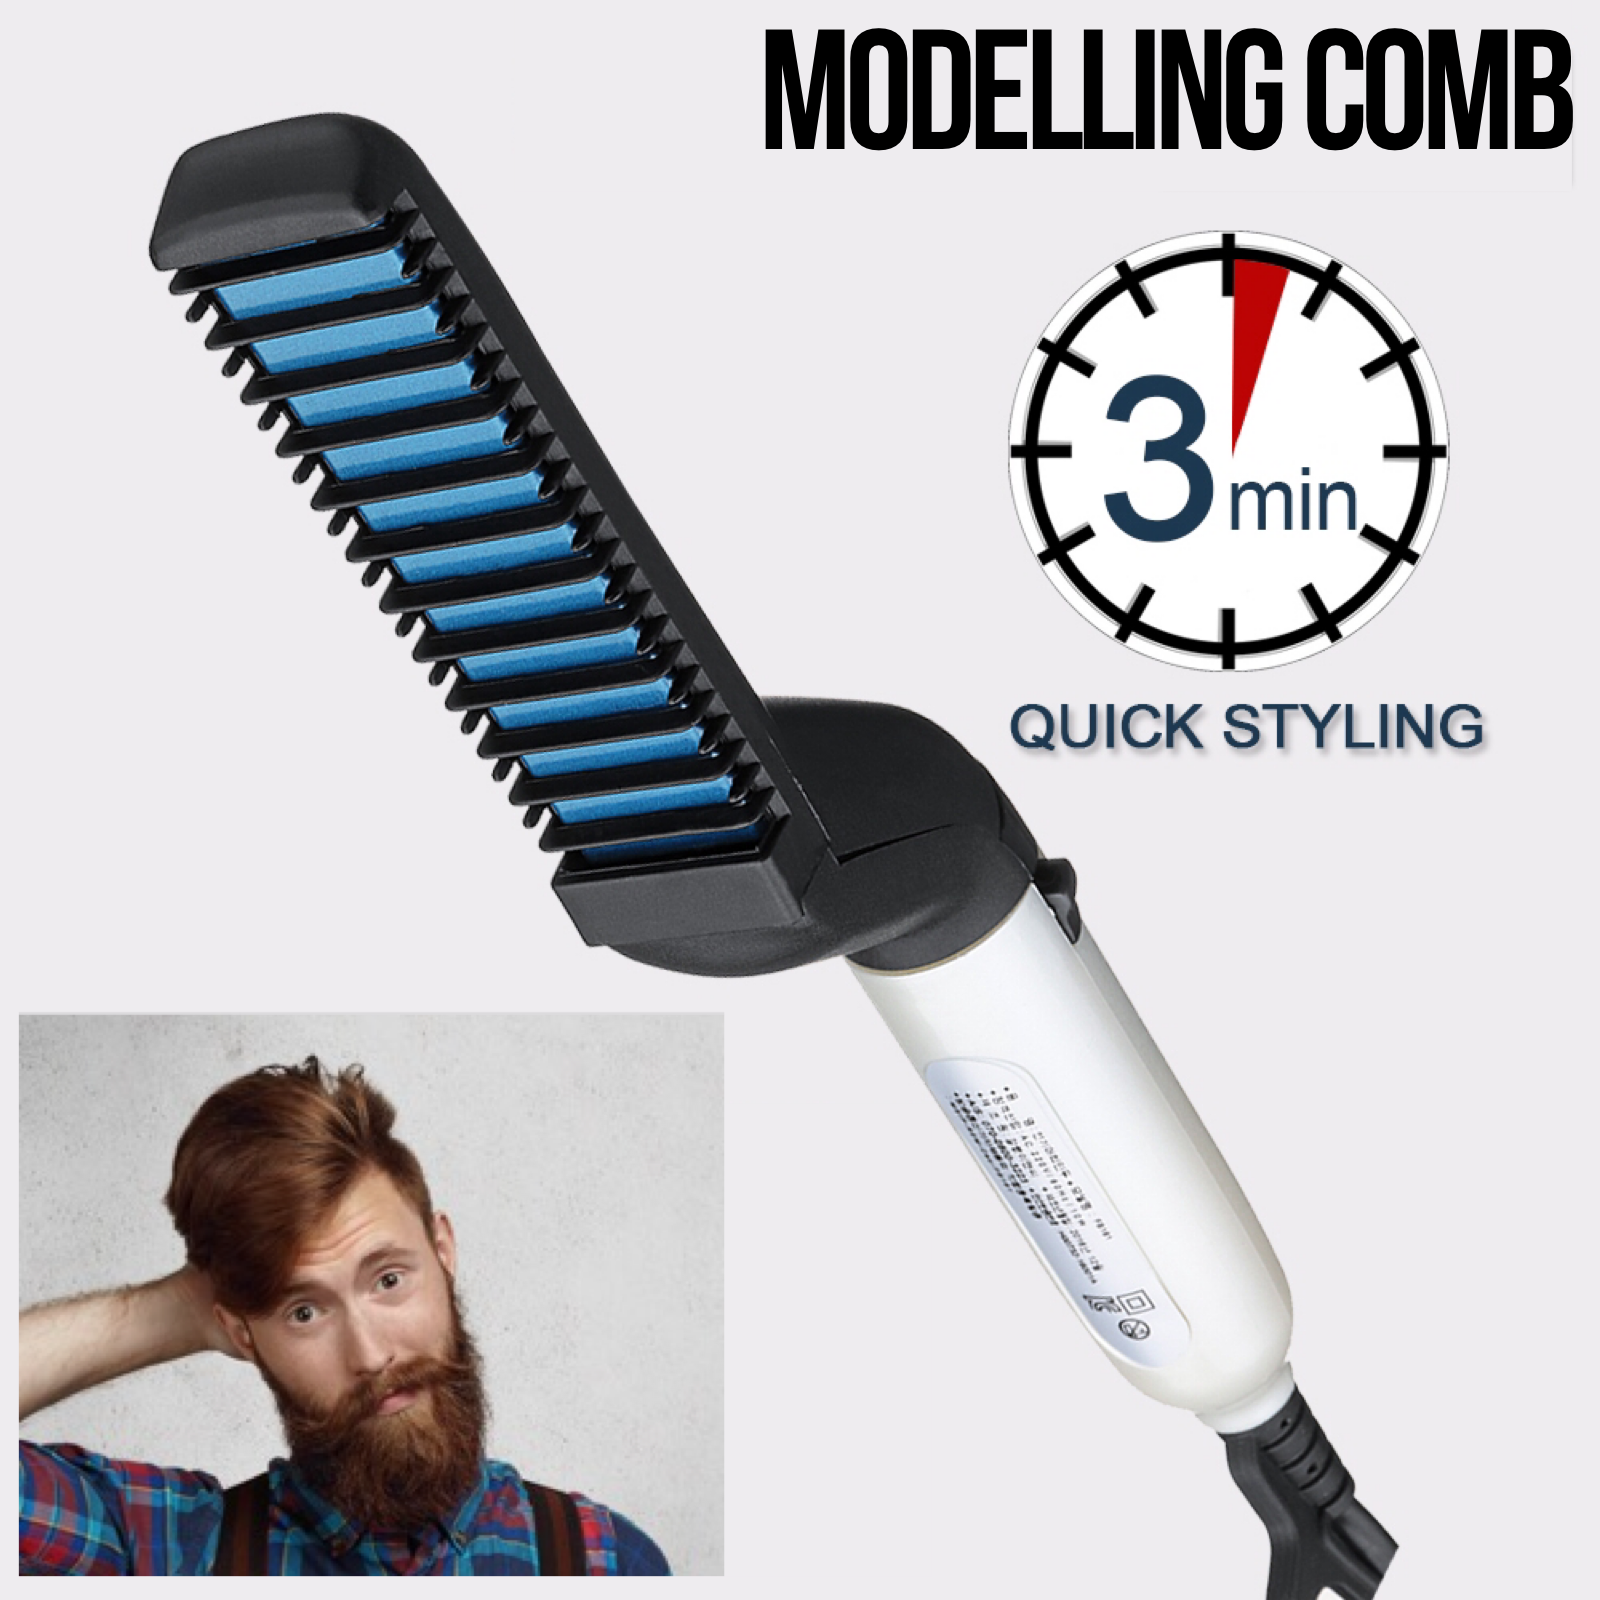 M-STYLER M-STYLER MODELLING COMB